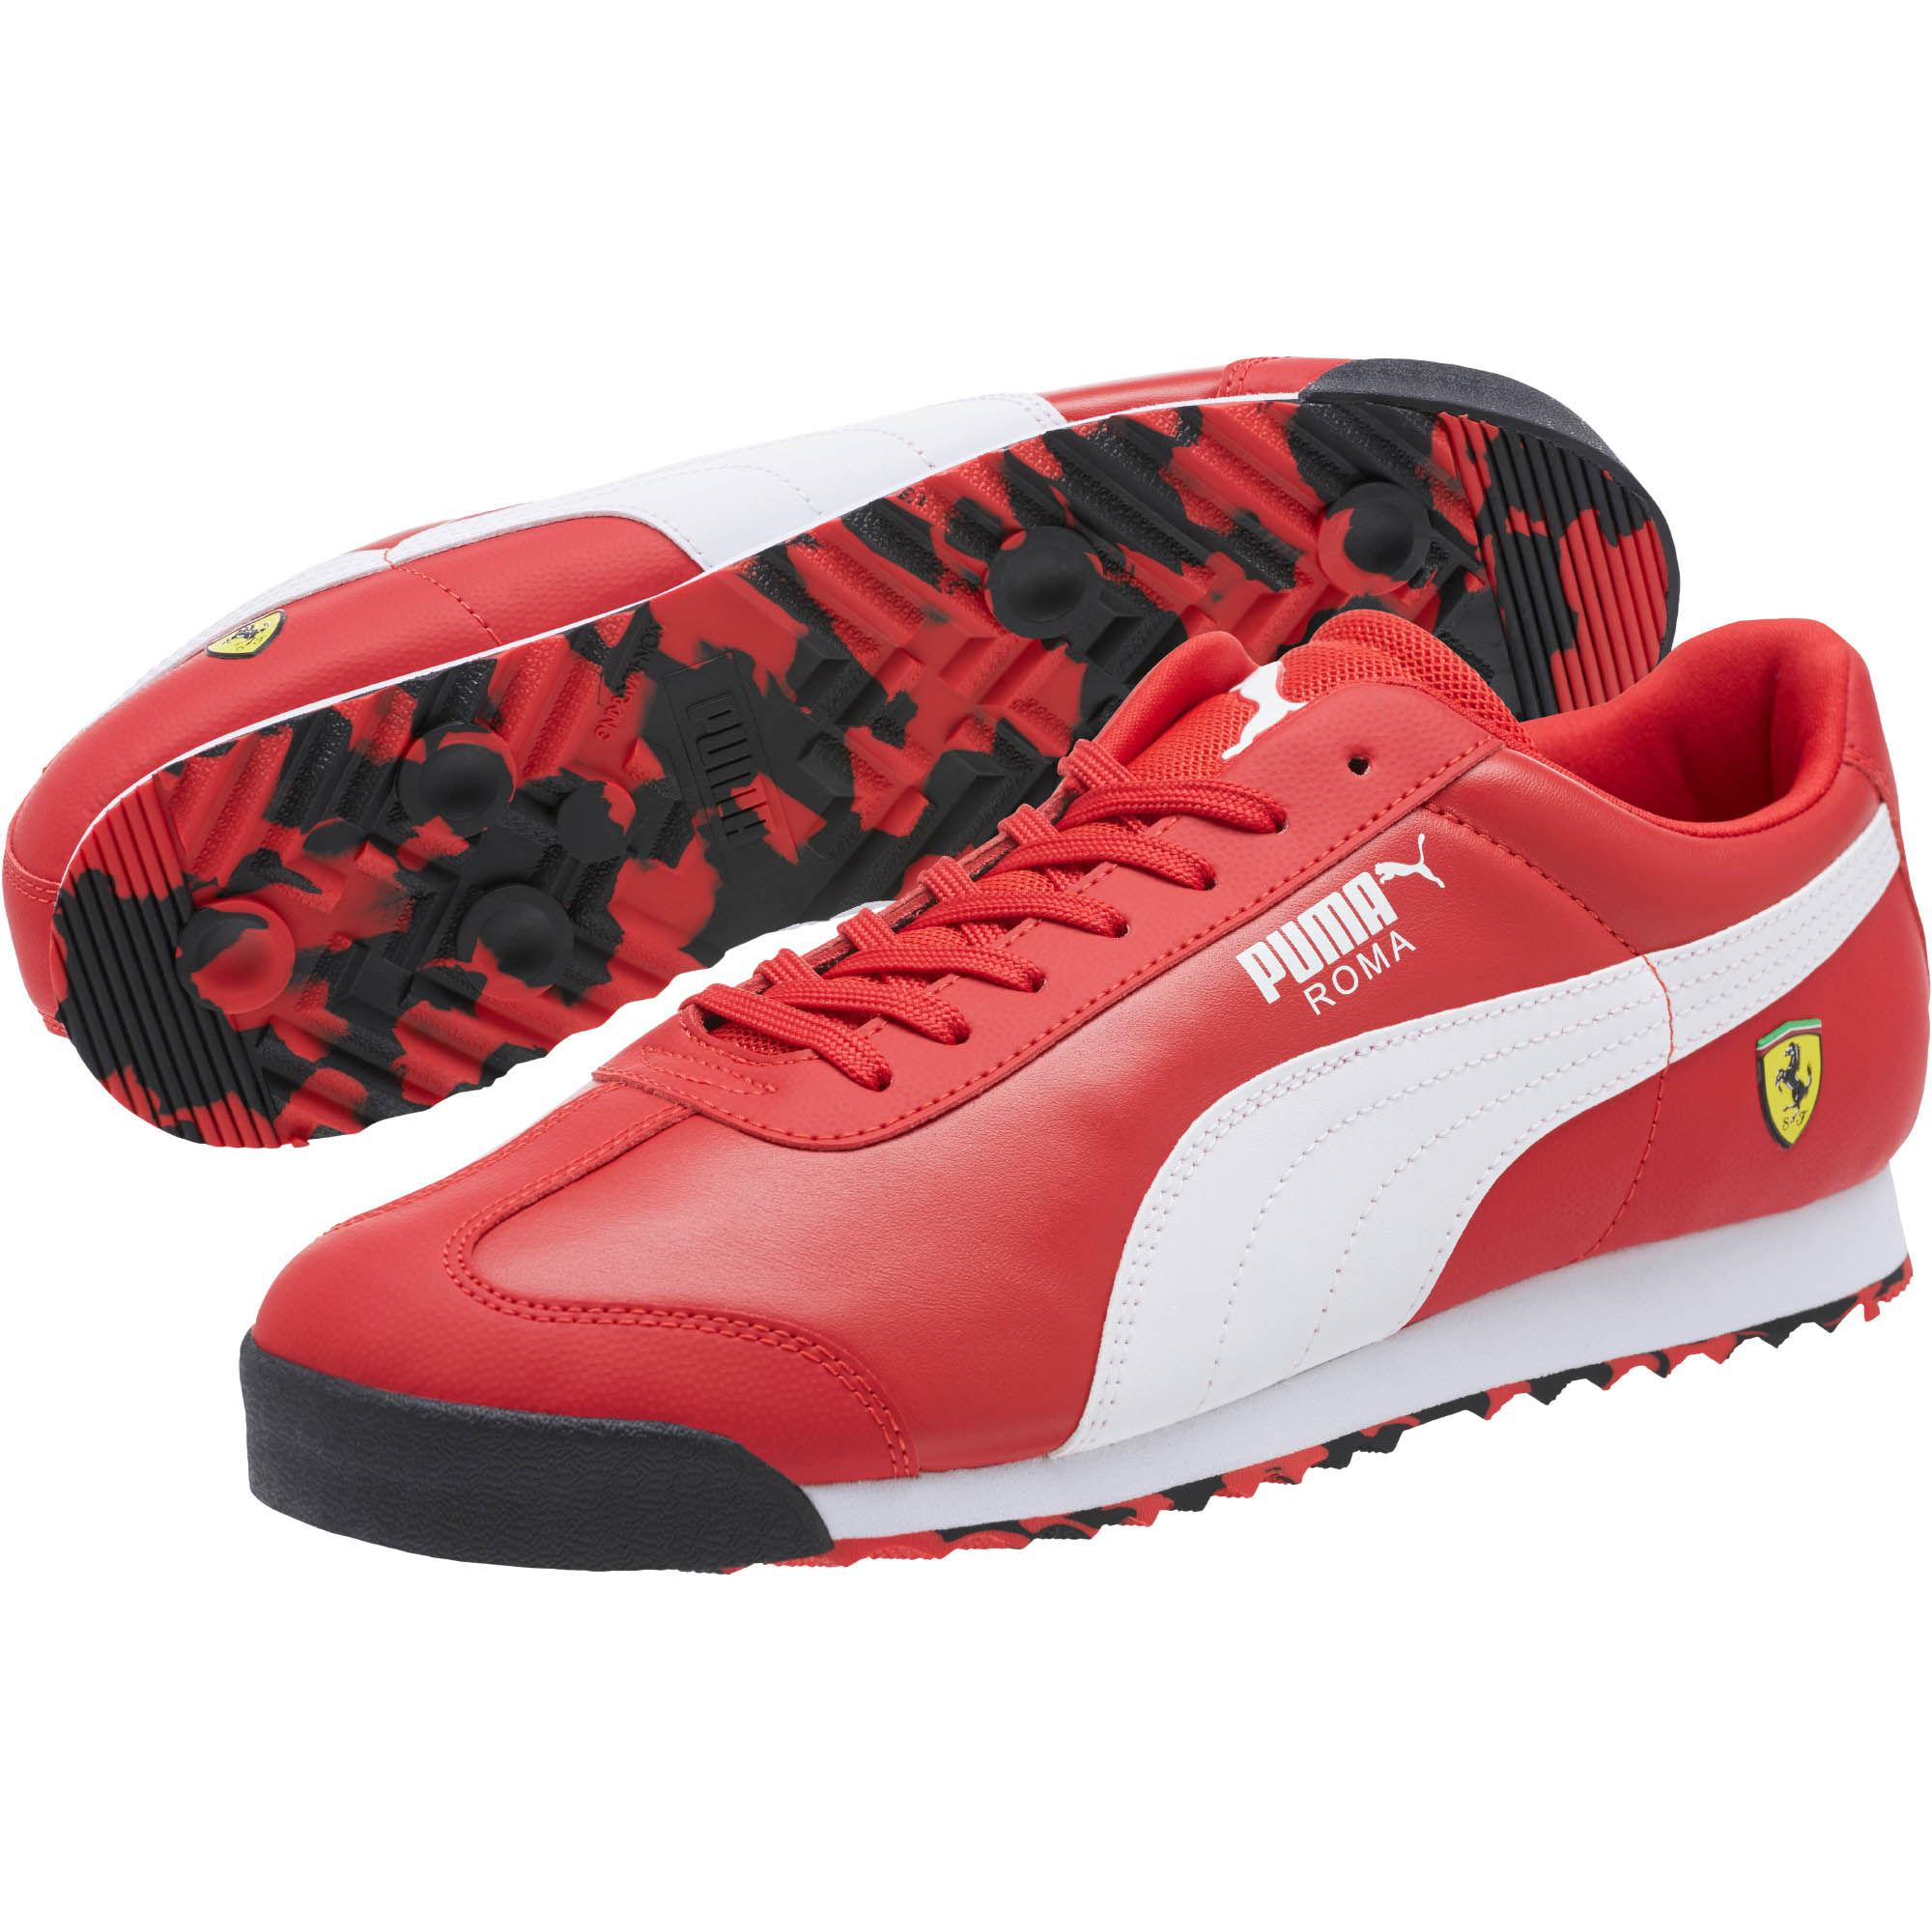 casual shoes rrp trainers scuderia itm speziale puma trainer wayfarer new mens motorsport ferrari